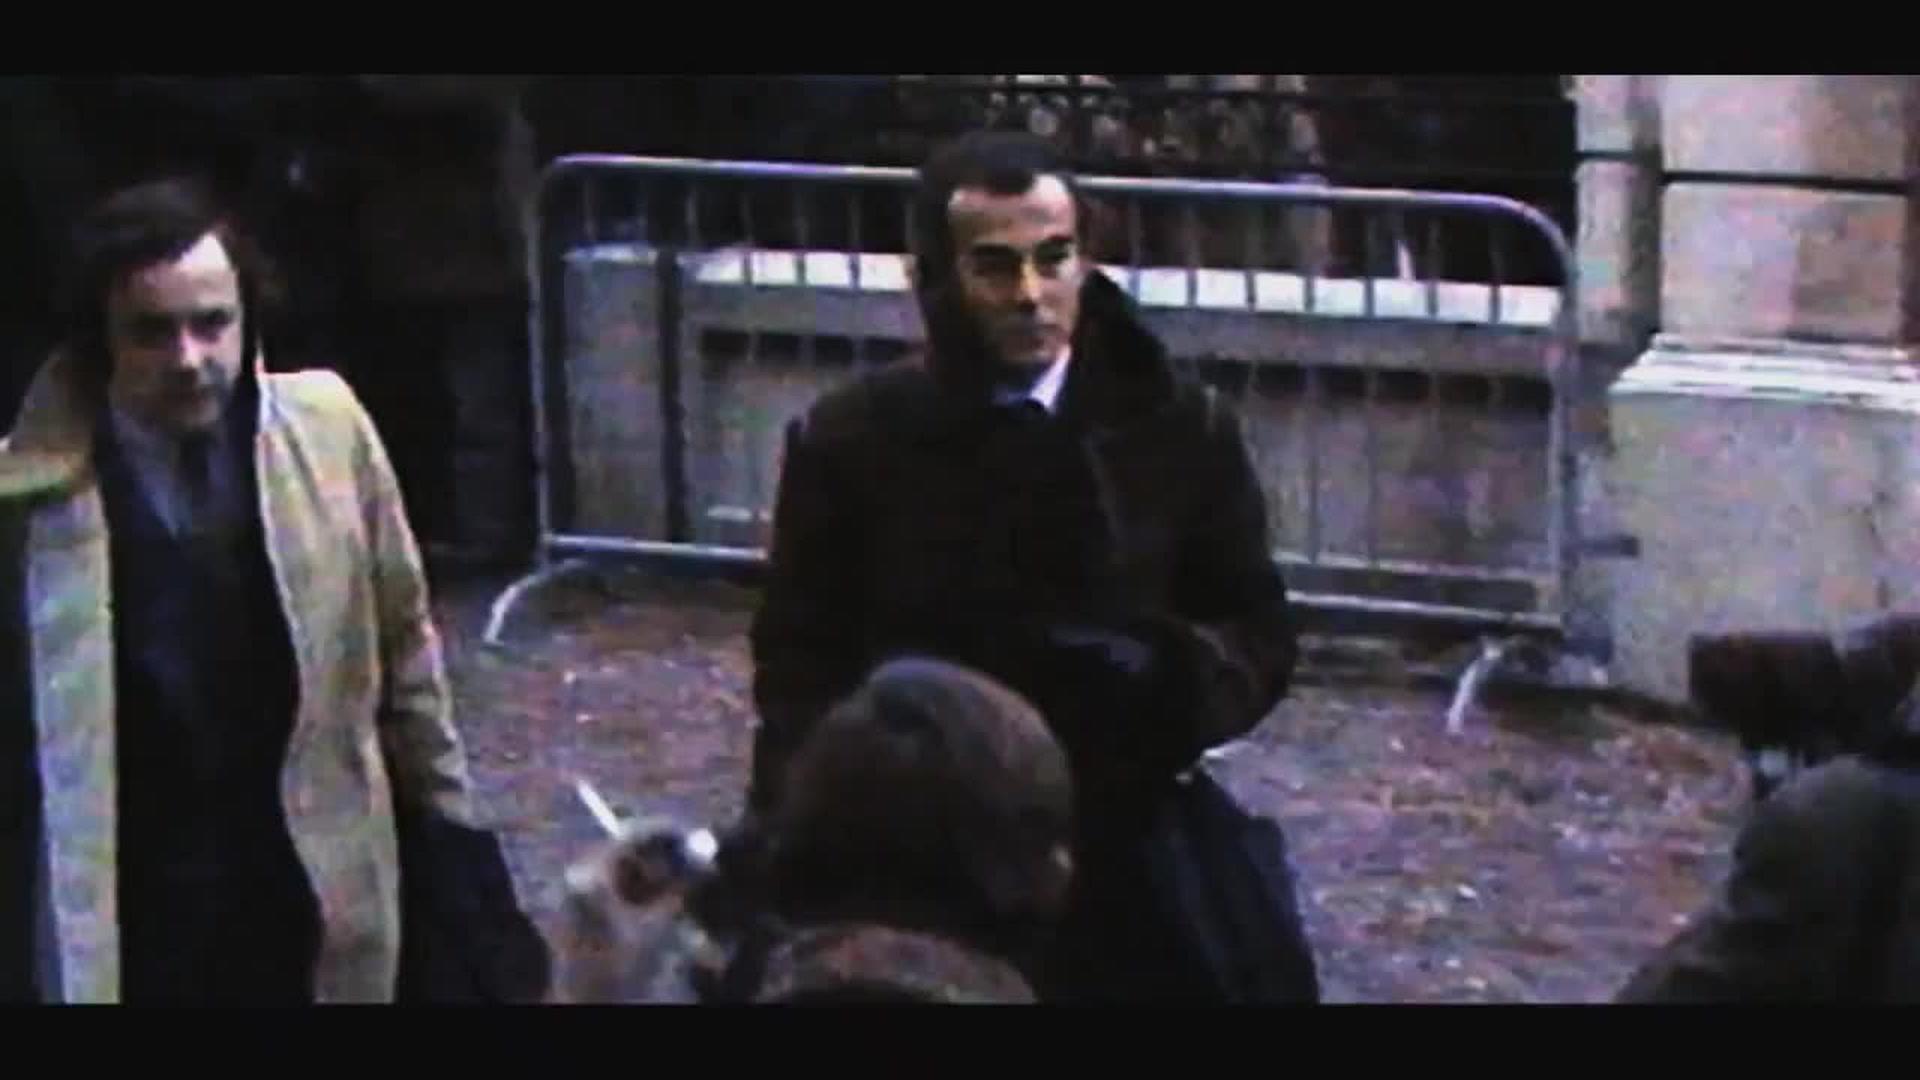 Un jour, un destin : Robert Badinter, un cri de révolte